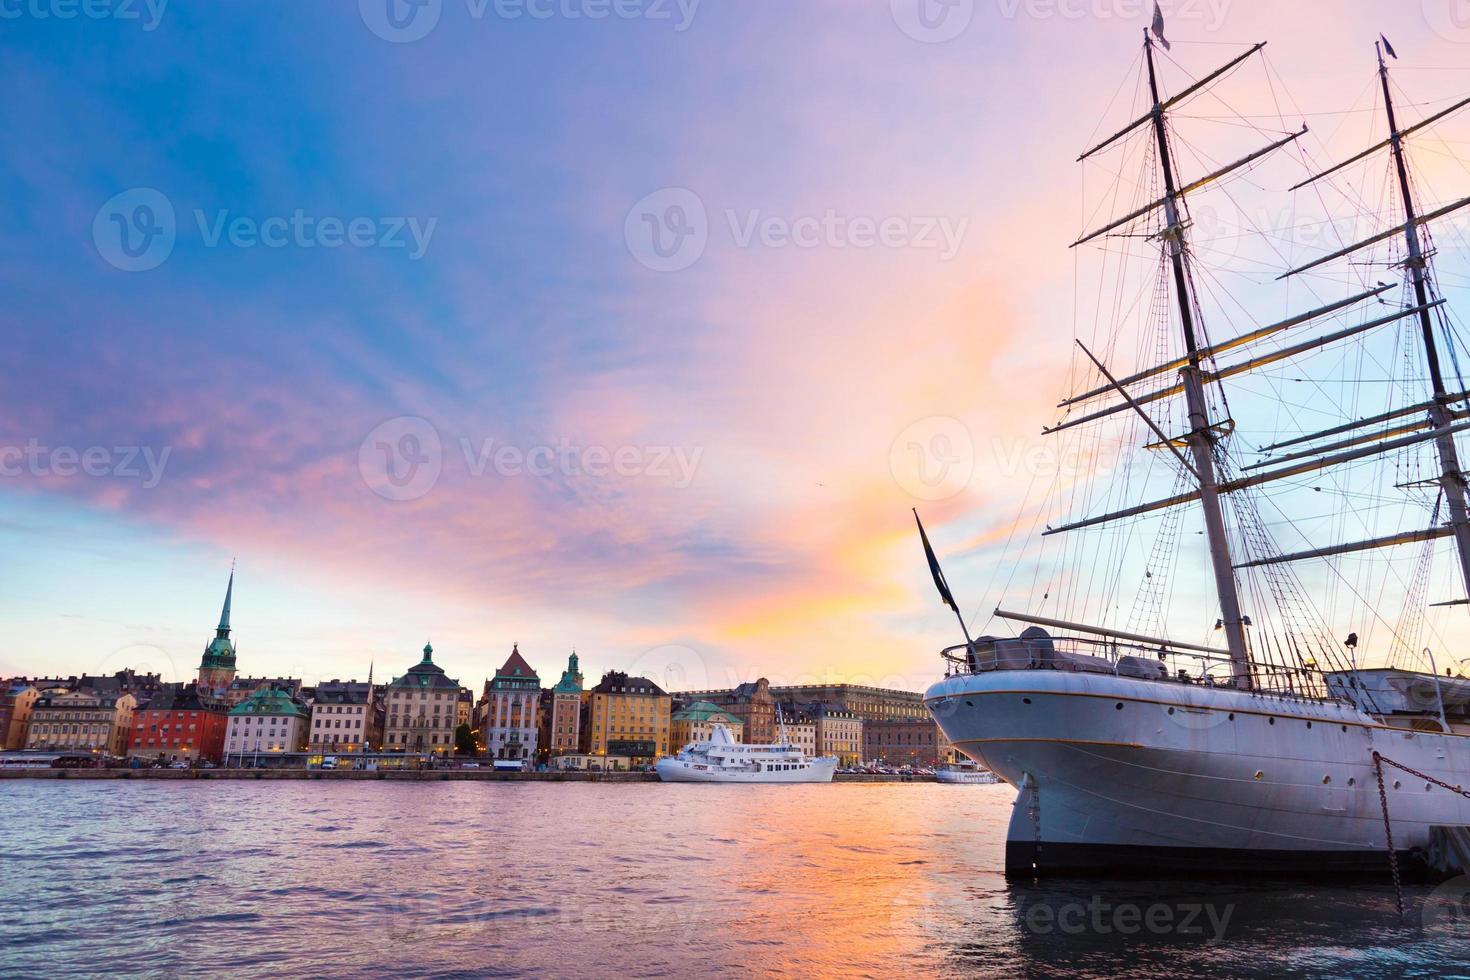 traditionell seilbåt i gamla stan, stockholm, sverige, europa. foto